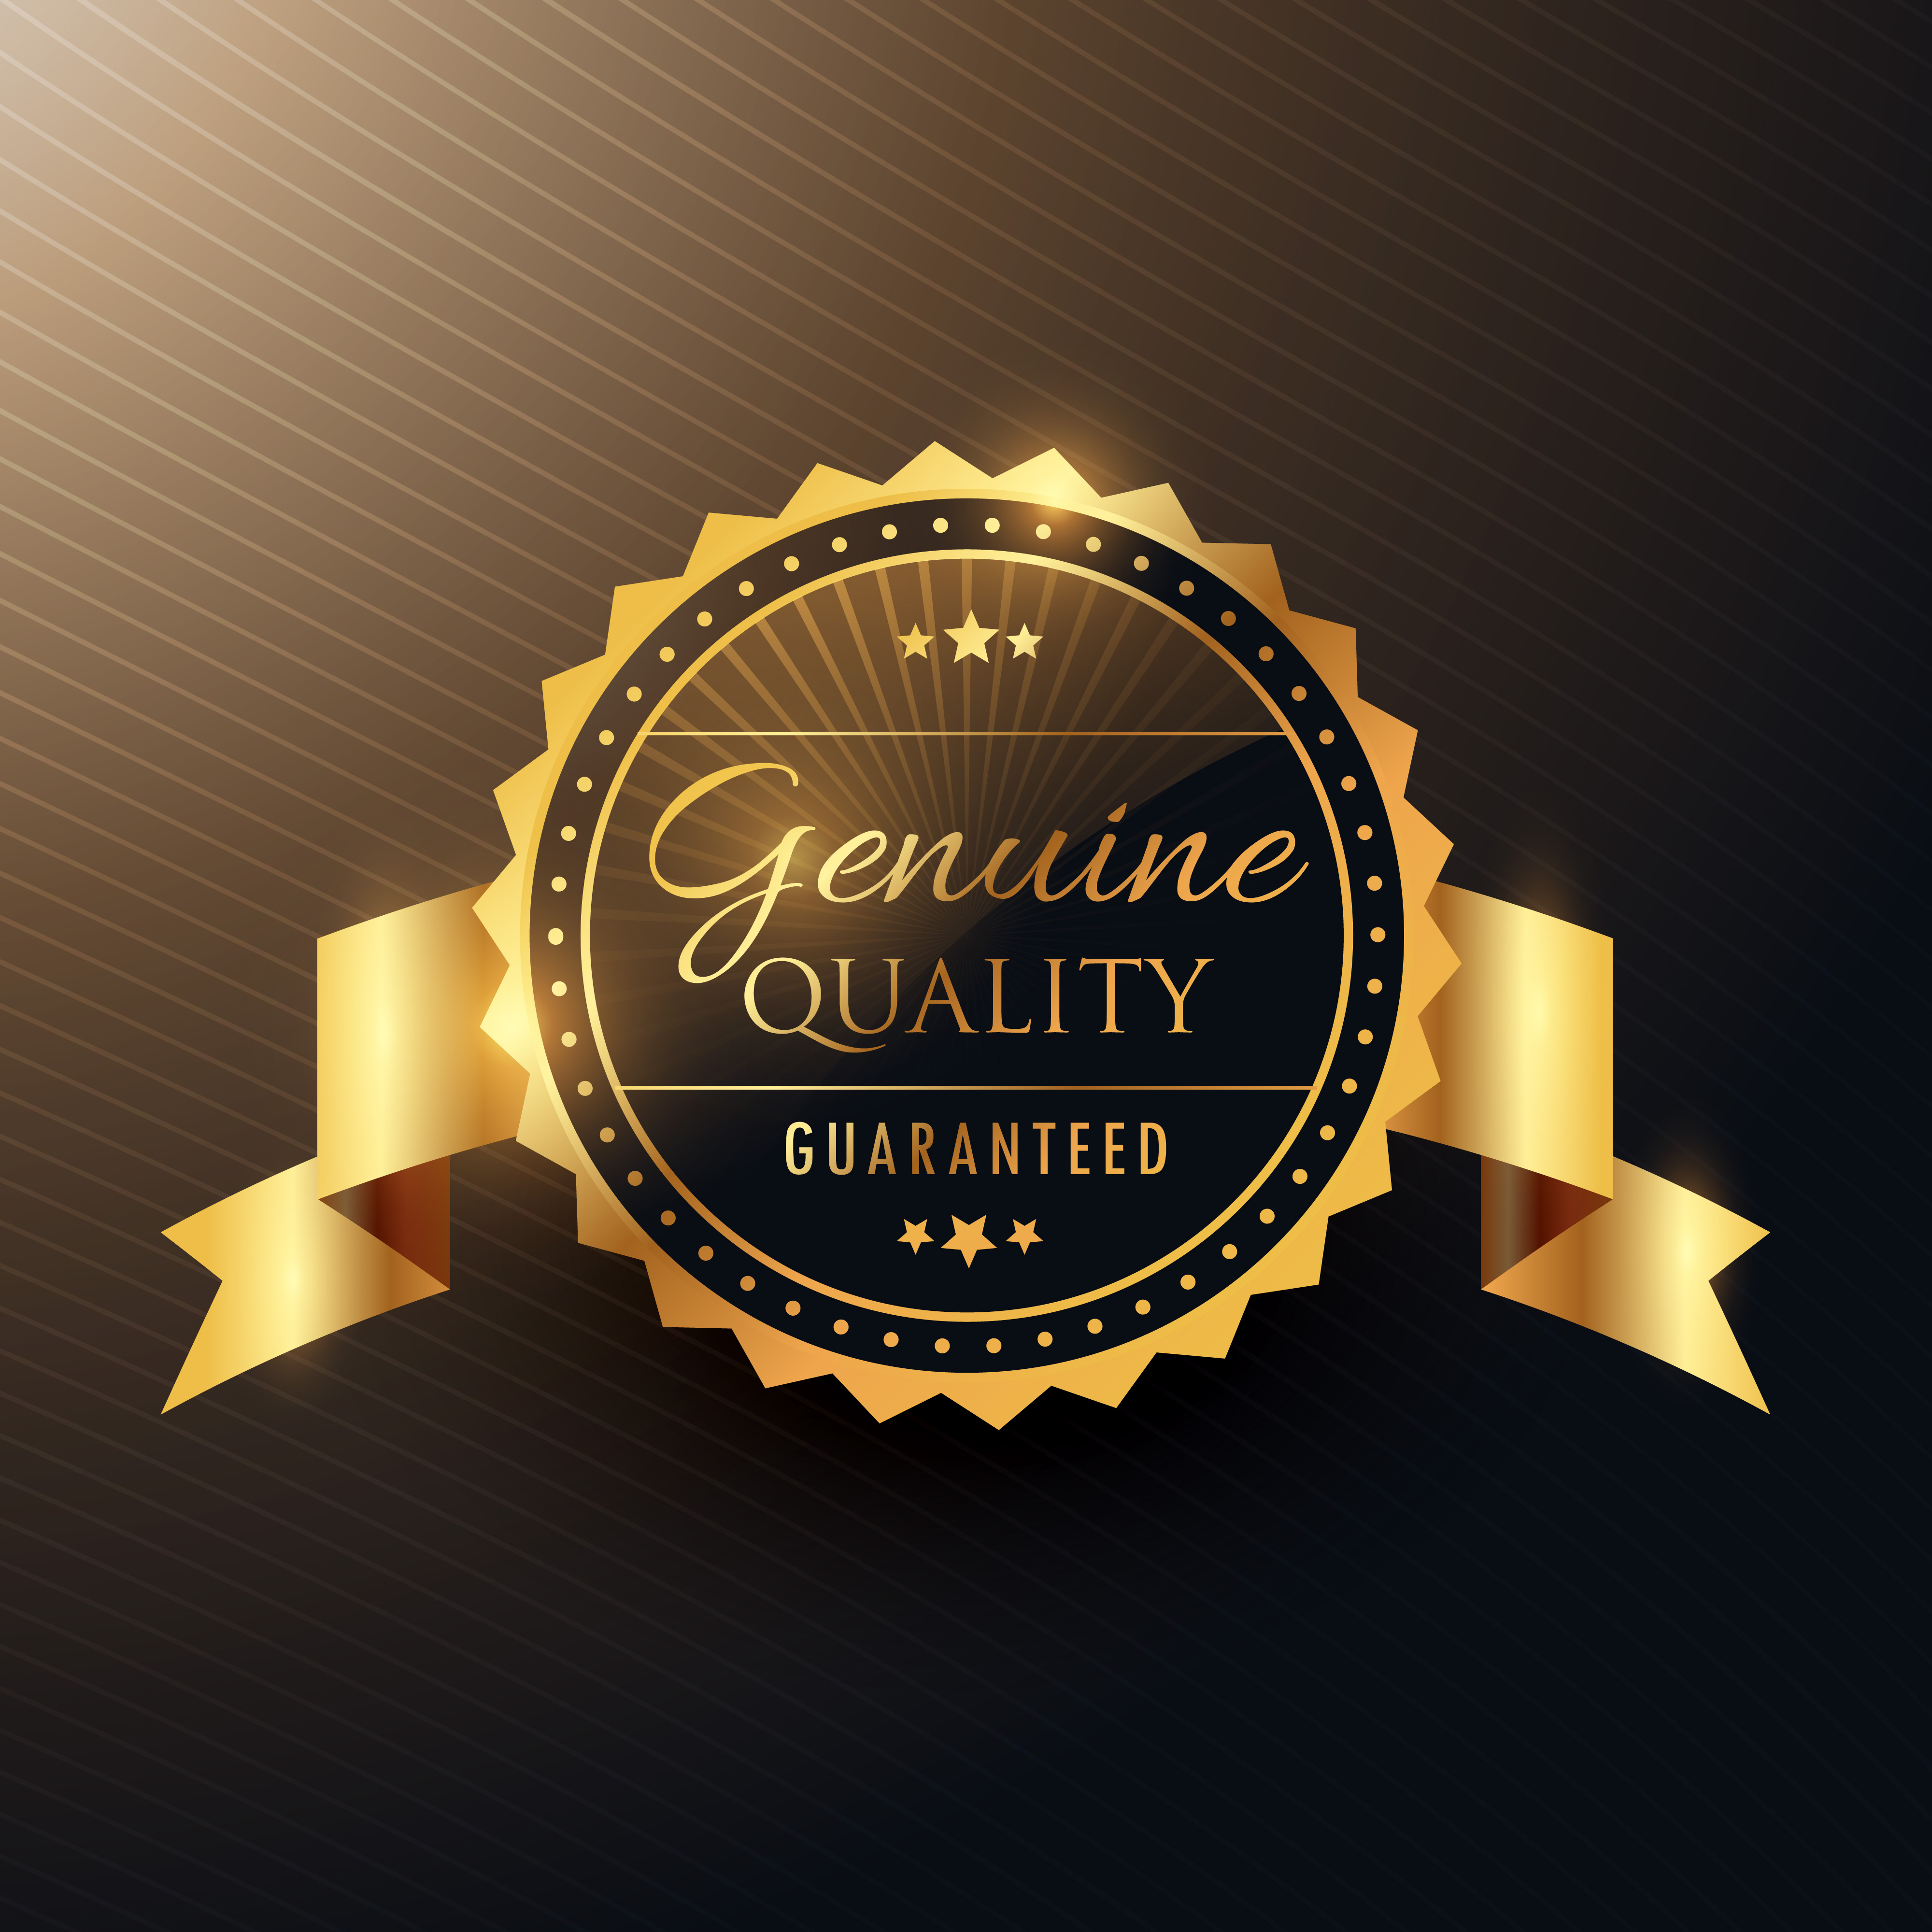 Malcolm Baldrige National Quality Award (MBNQA)